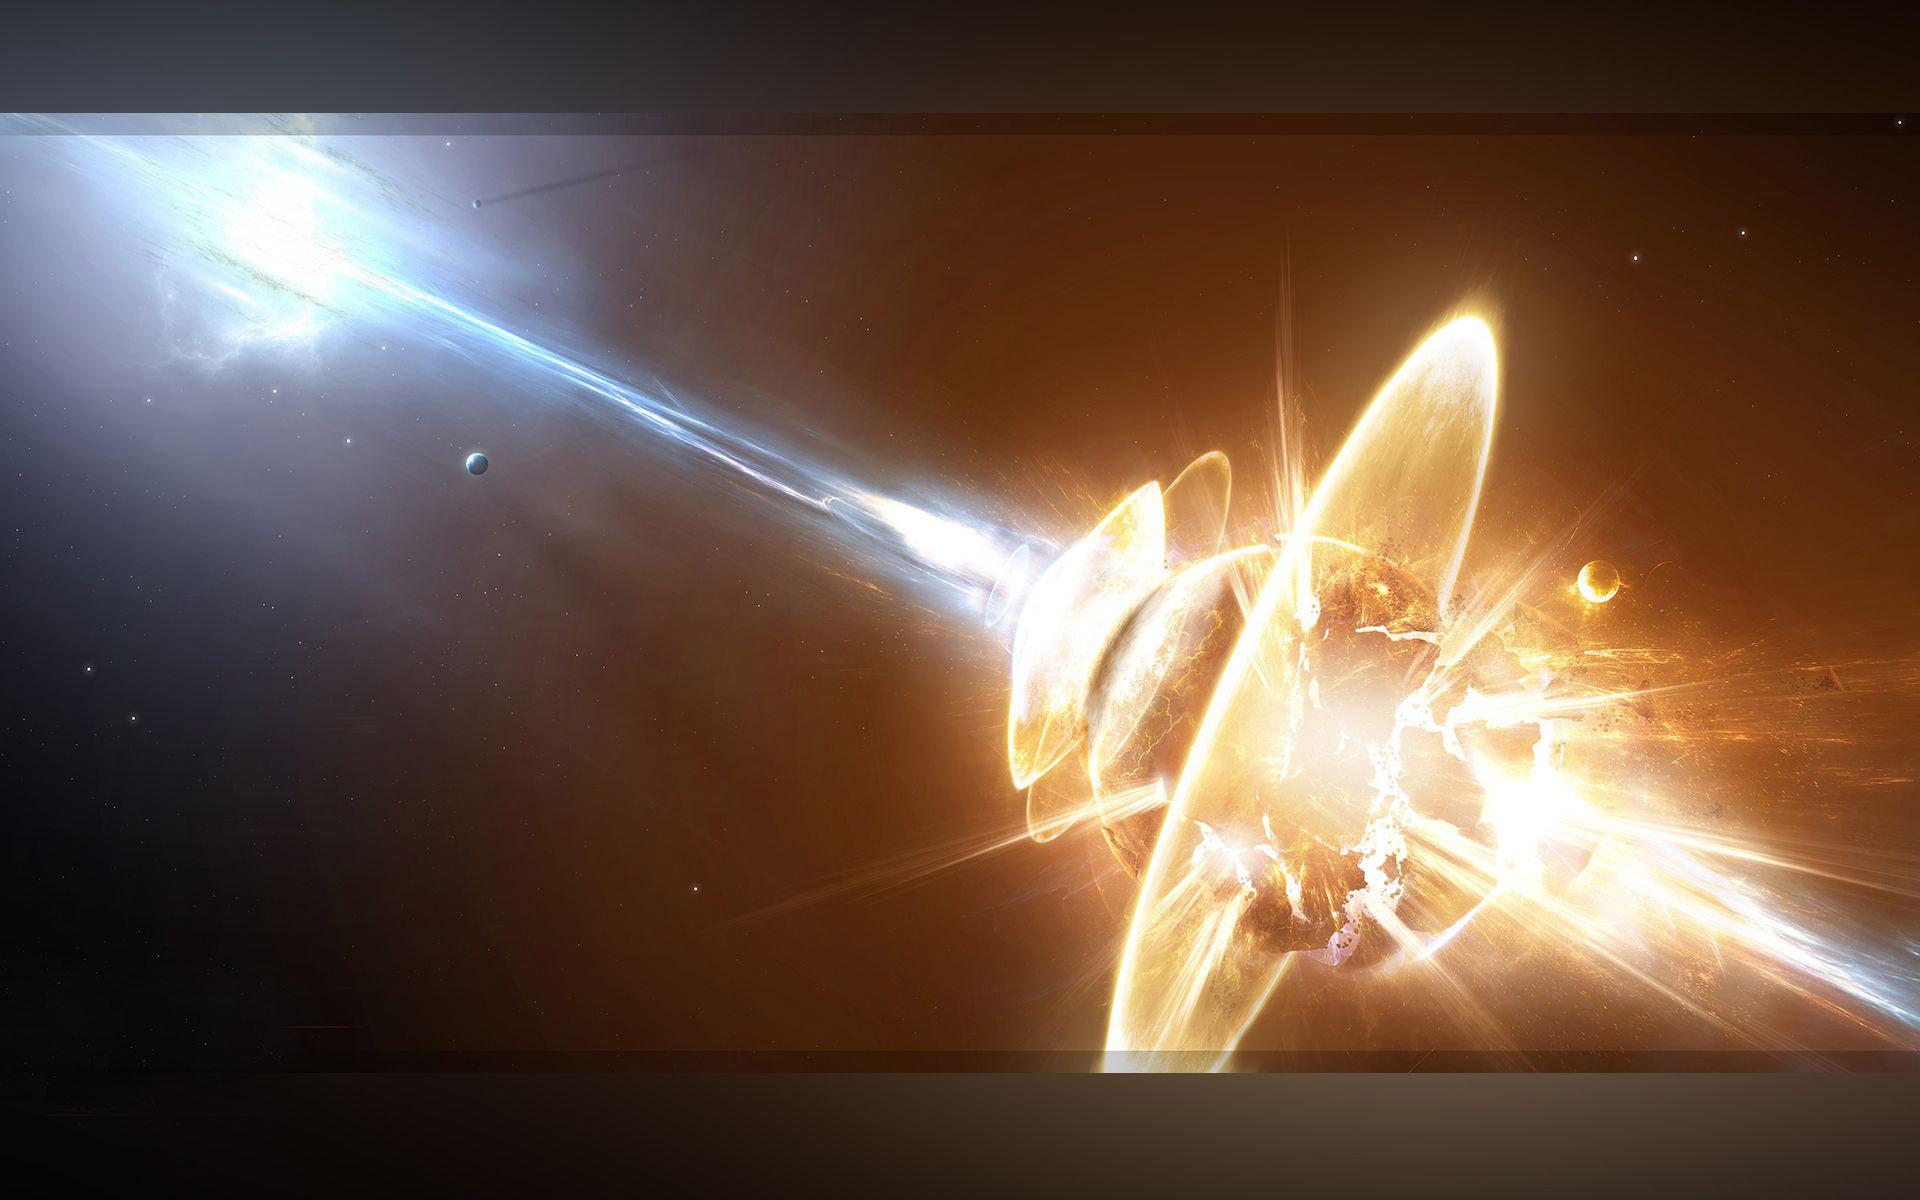 Planet Explosion Fantasy Hd Wallpaper X Jpg